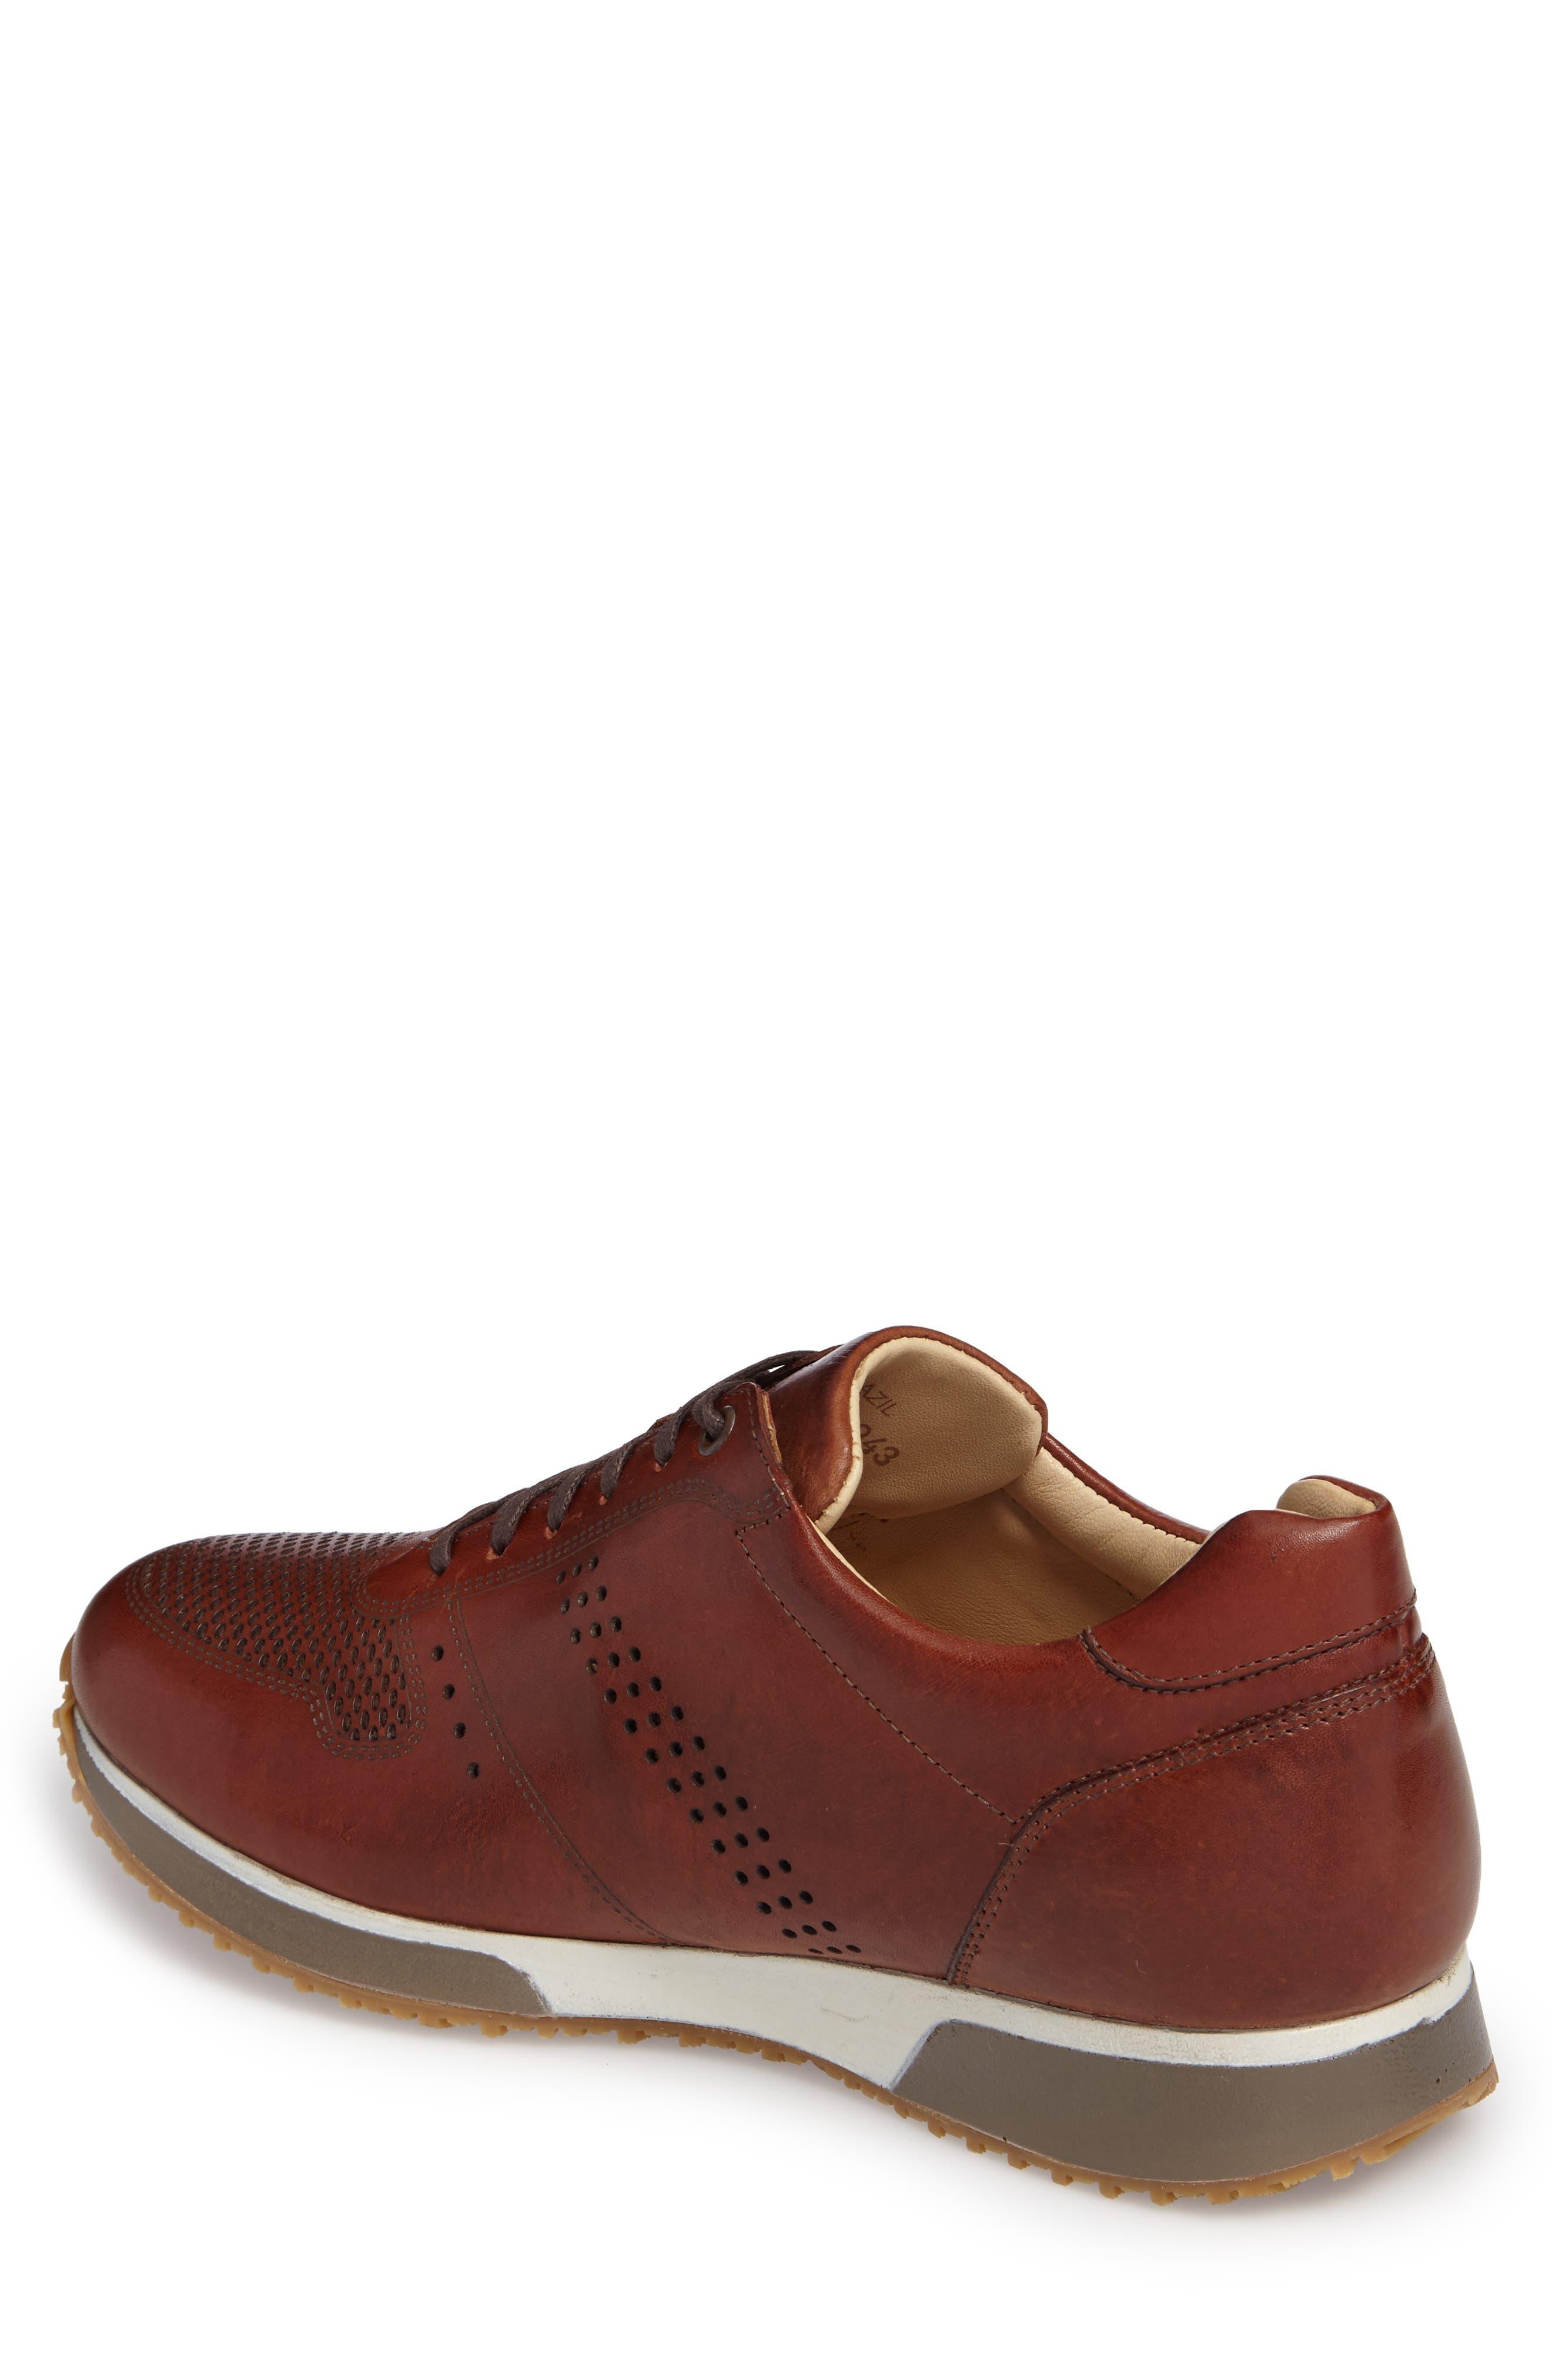 Classico Sneaker,                             Alternate thumbnail 3, color,